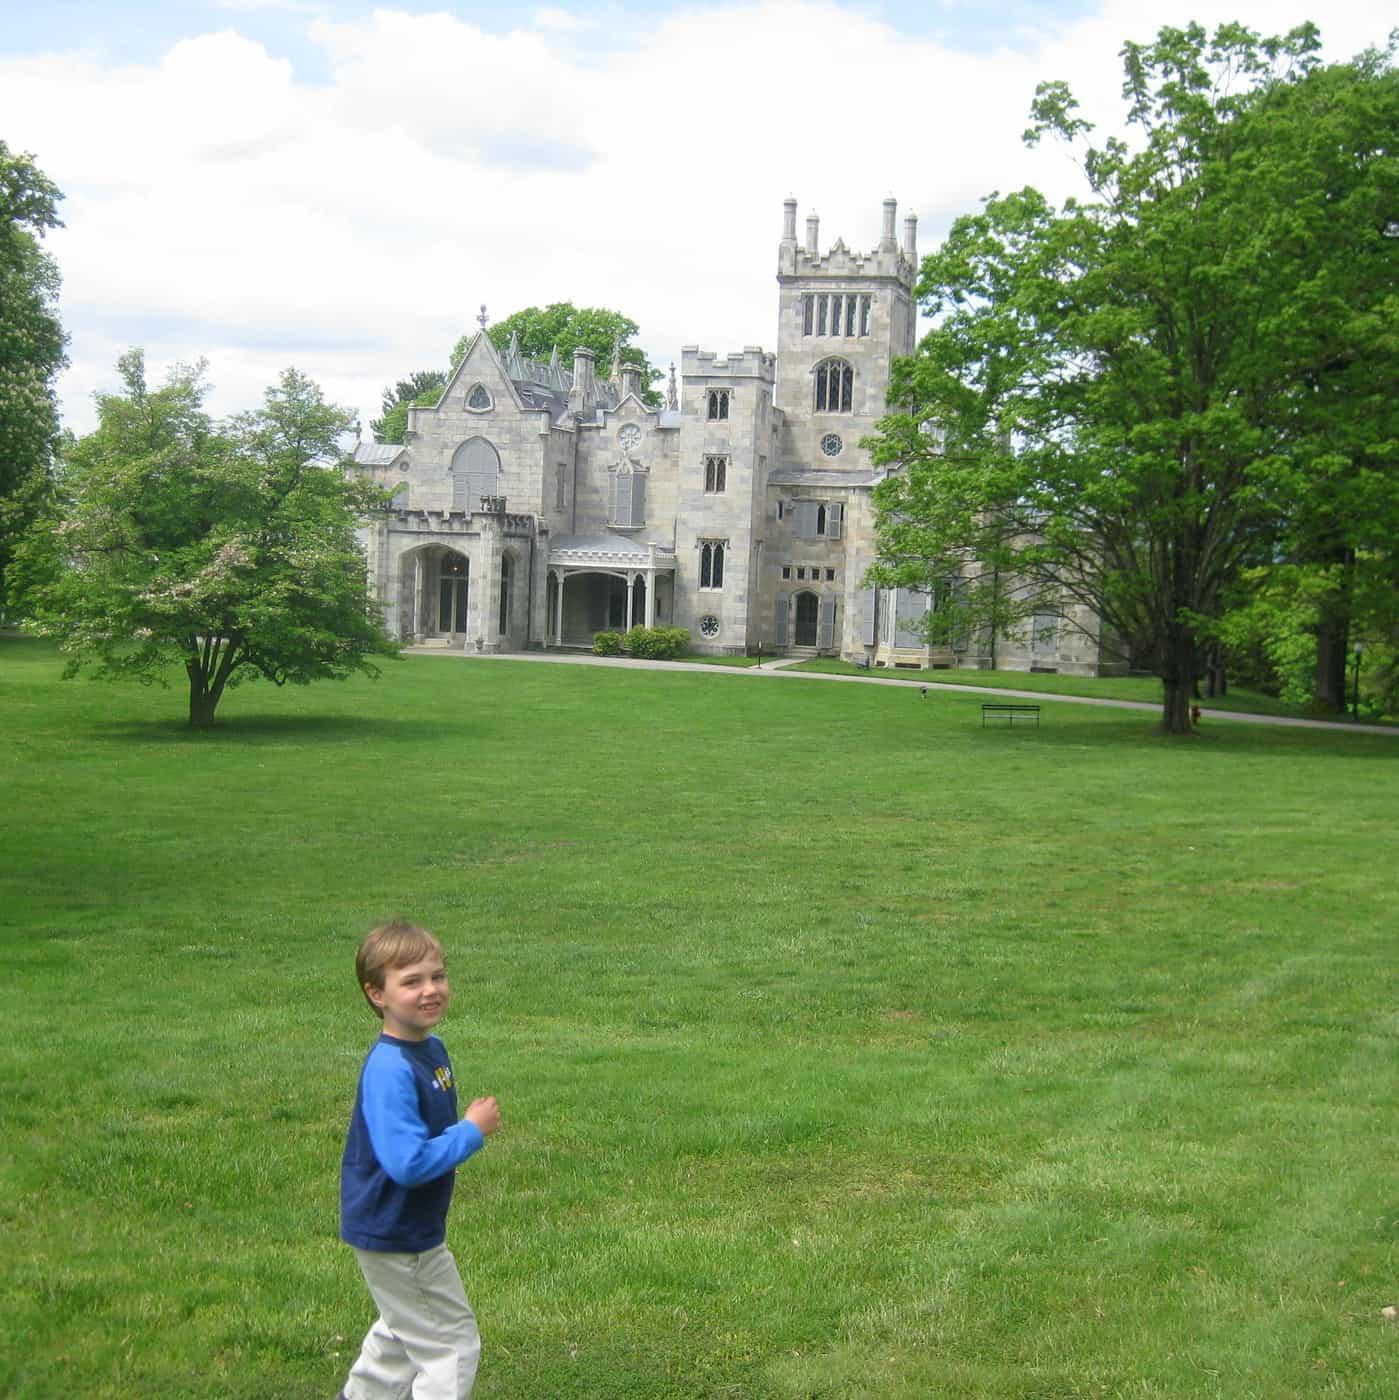 Lyndhurst Castle In Tarrytown, NY